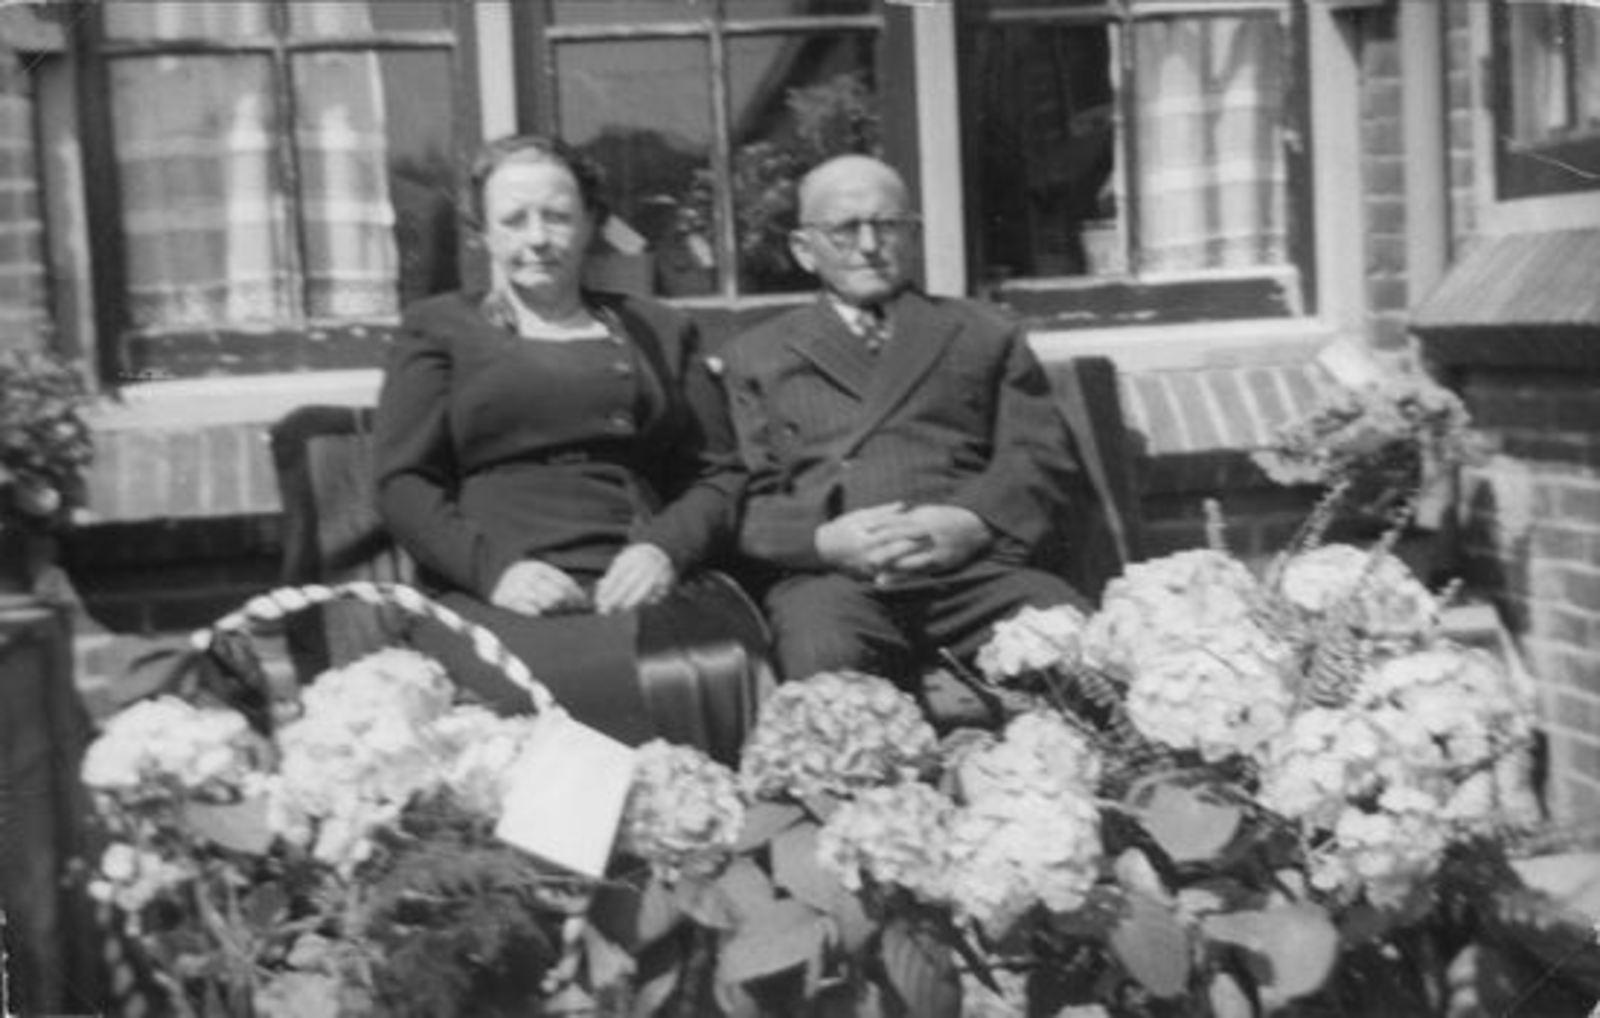 Broere Daniel 1890 19__ met vrouw Jacoba Vlug Jubileum 02